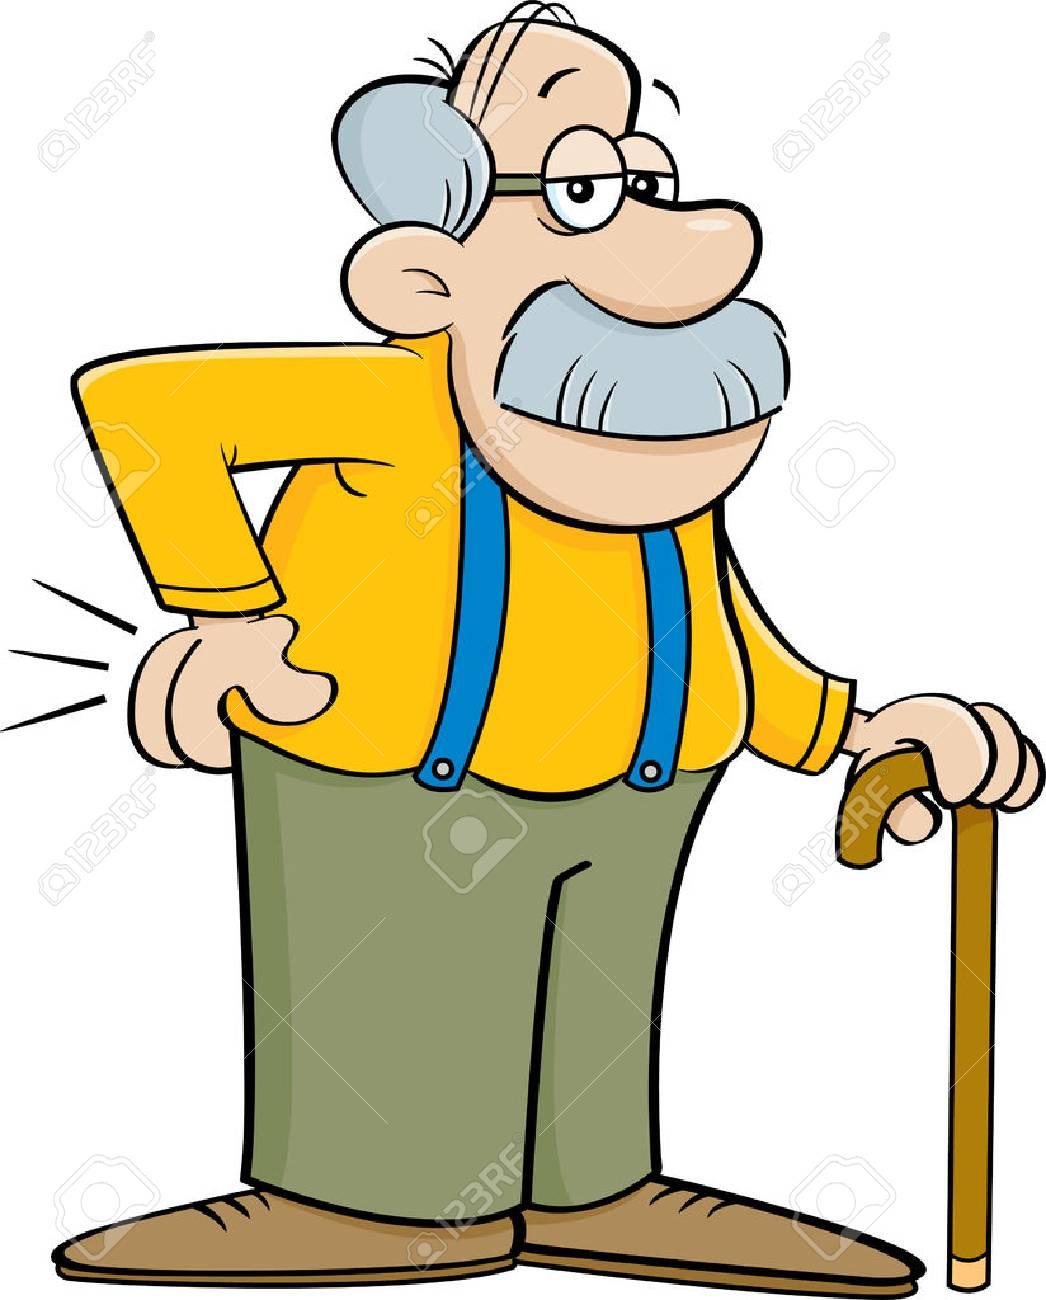 Dessin animé vieil homme sexe